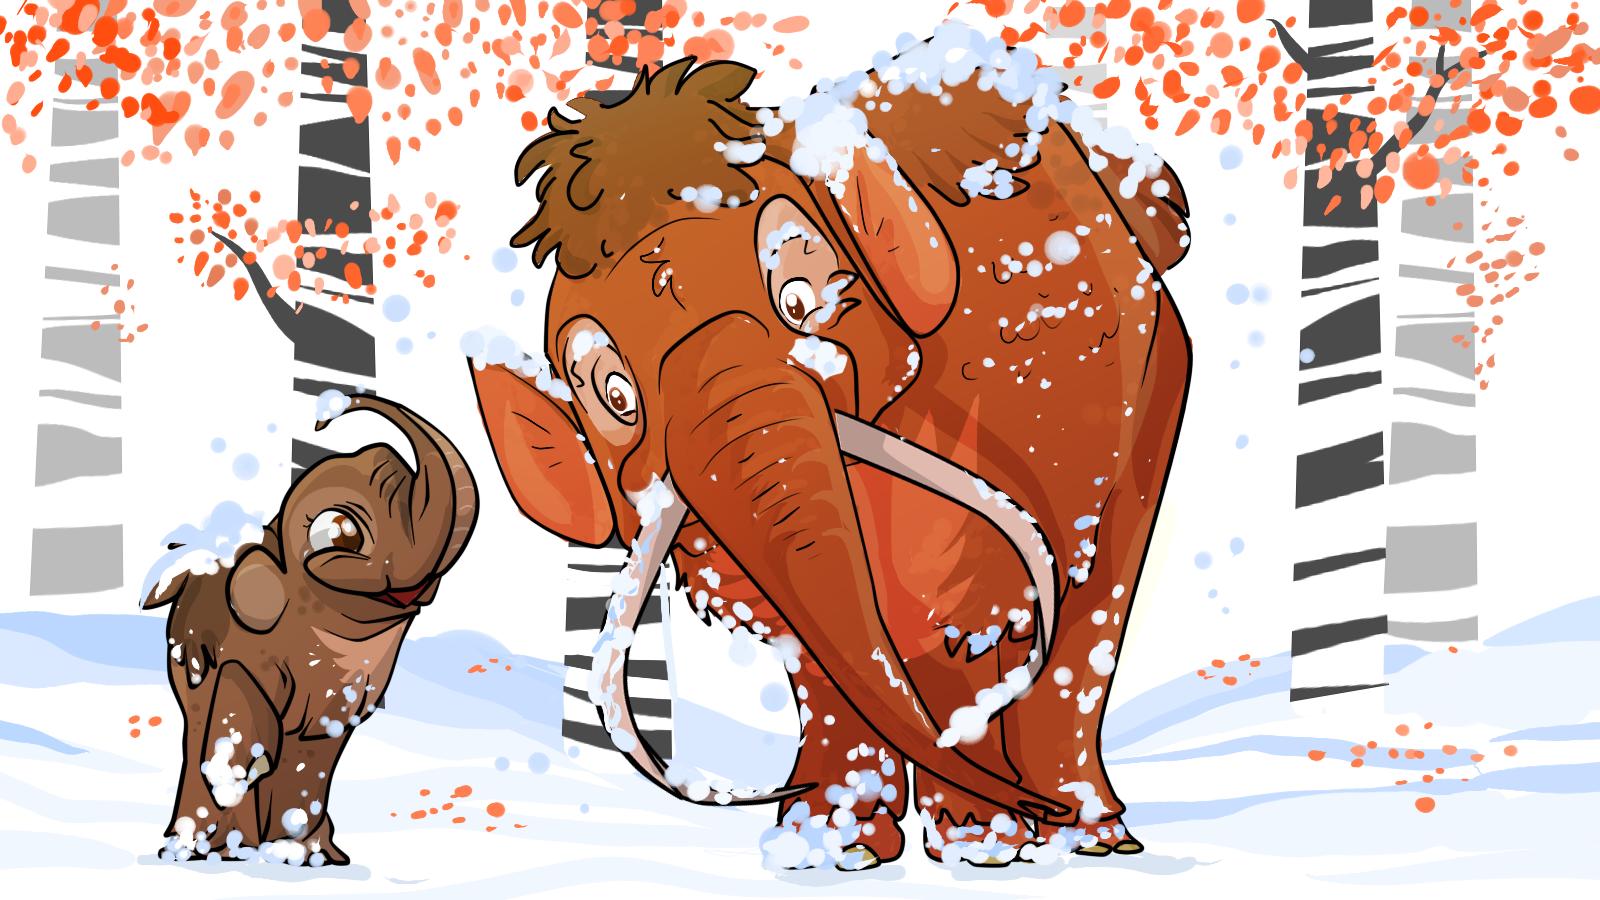 Mammoths by Natalia Jaglielska